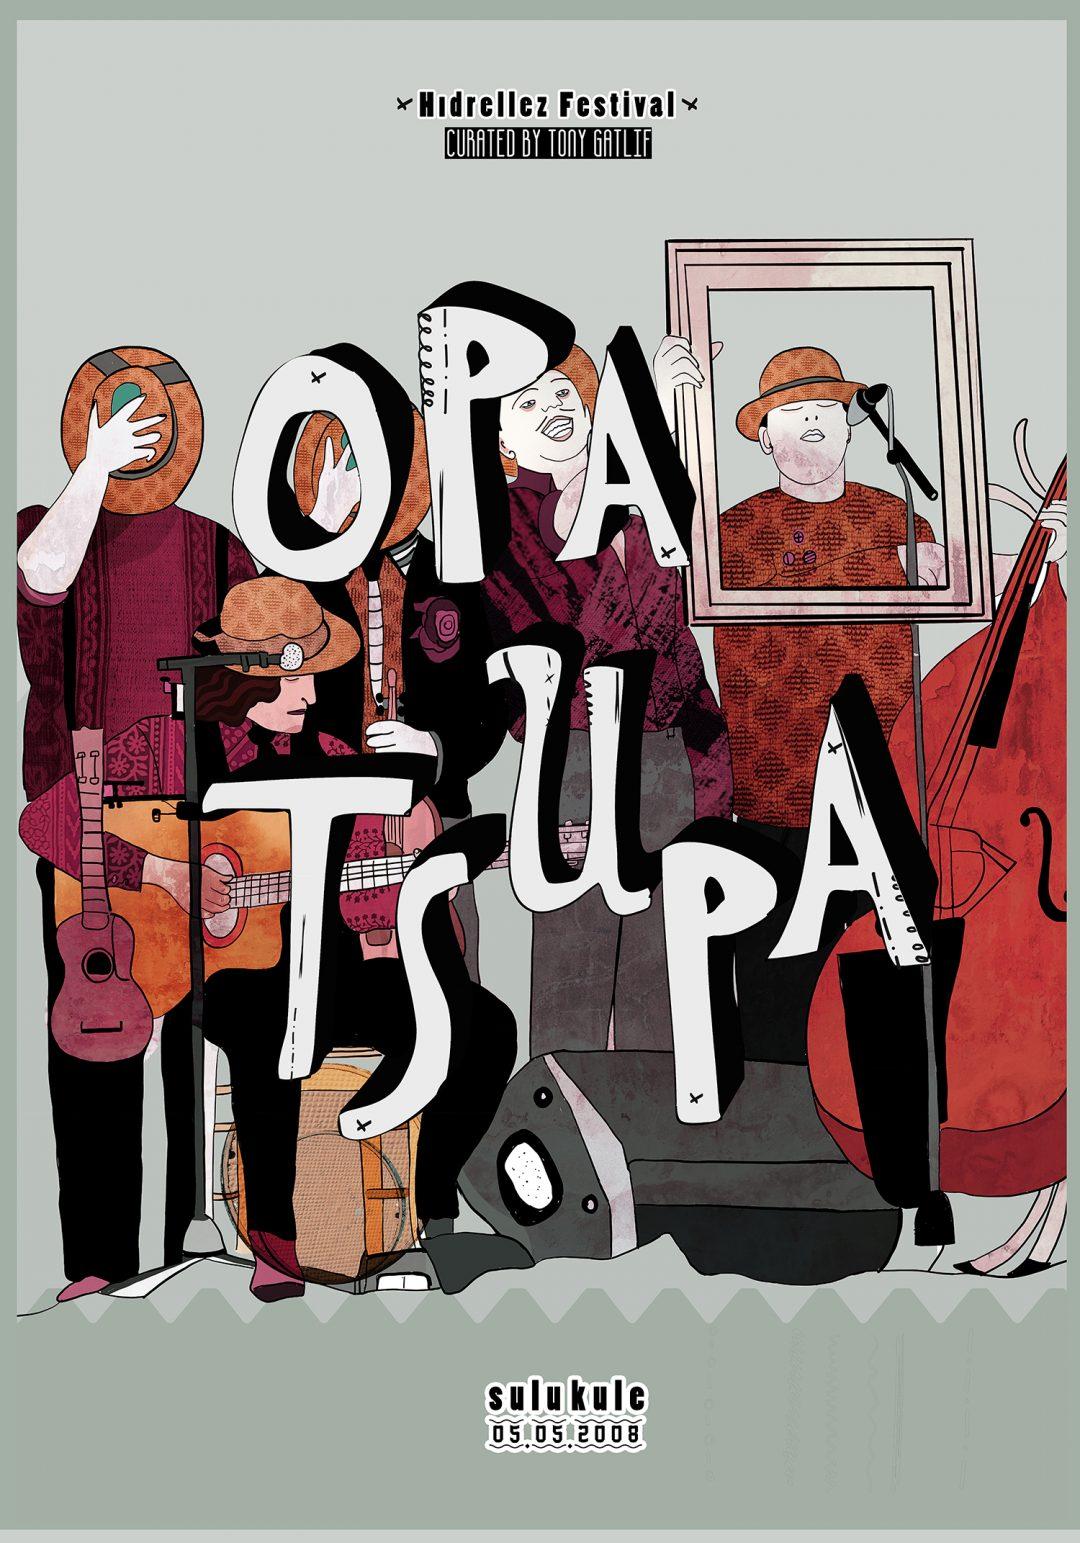 Dream Gigs Illustrated: Berna Kılıçoğlu - Opa Tsupa @ Sulukule